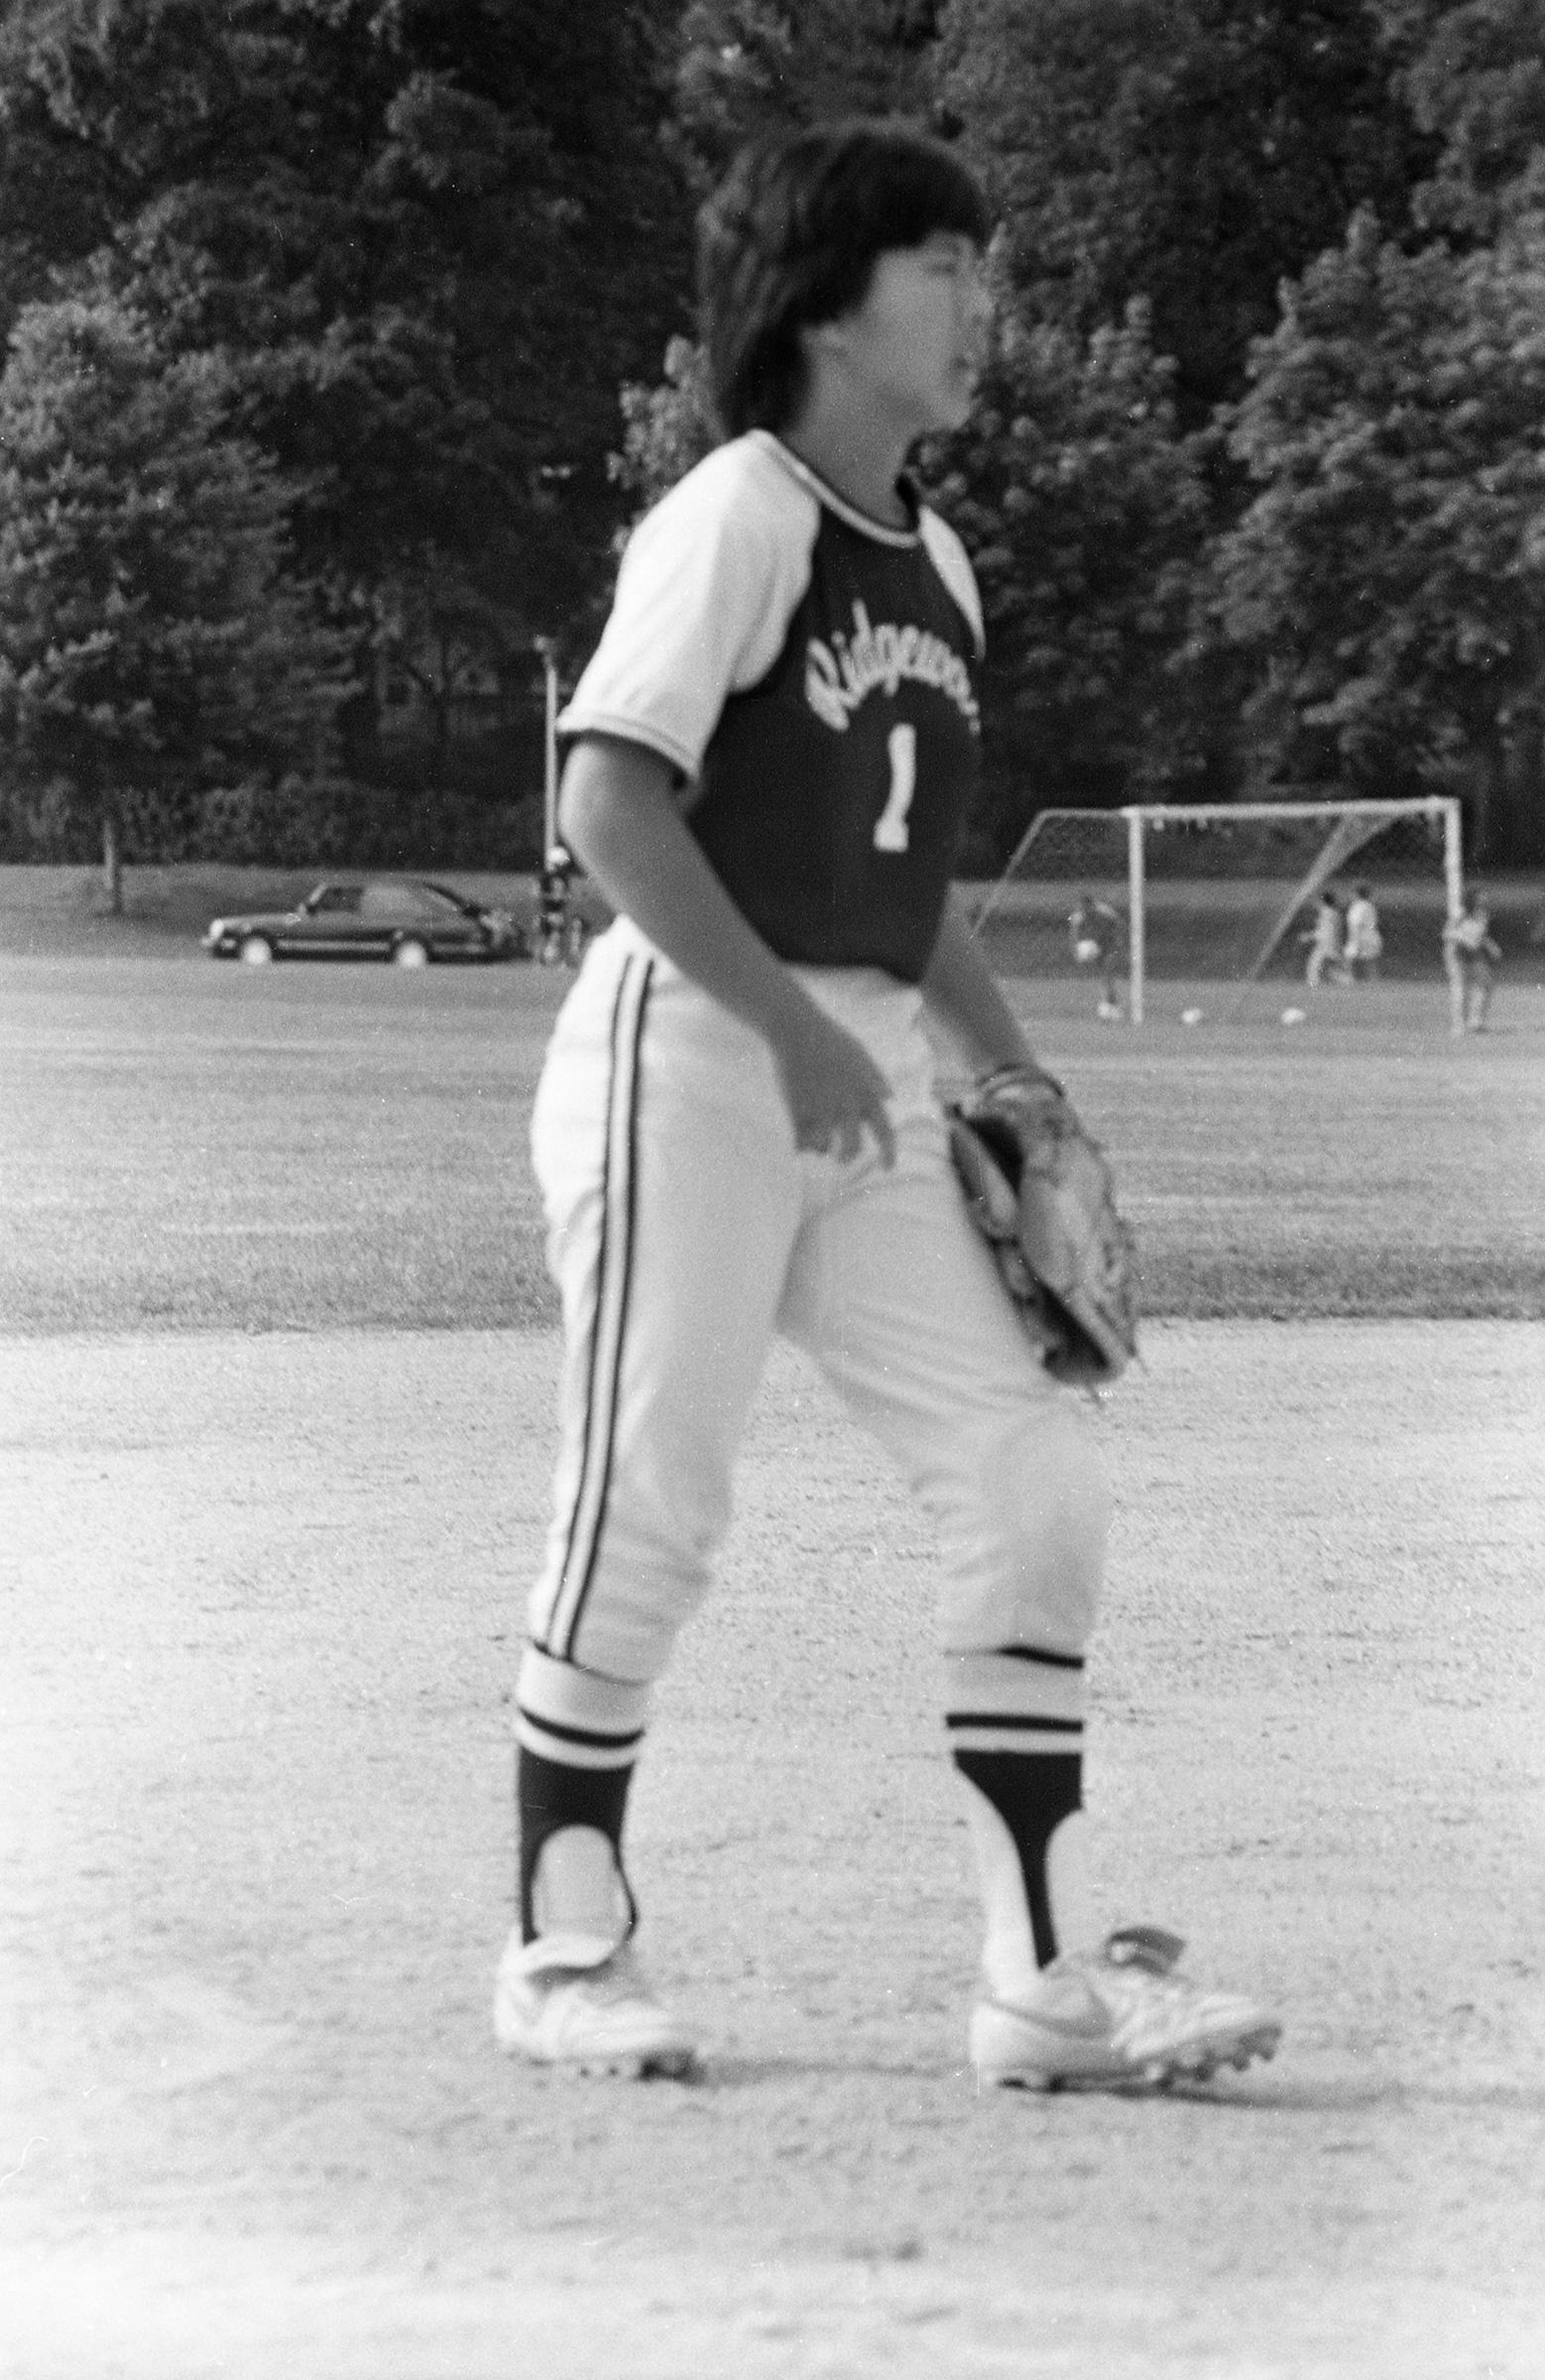 Ng playing softball at Ridgewood High School in 1986